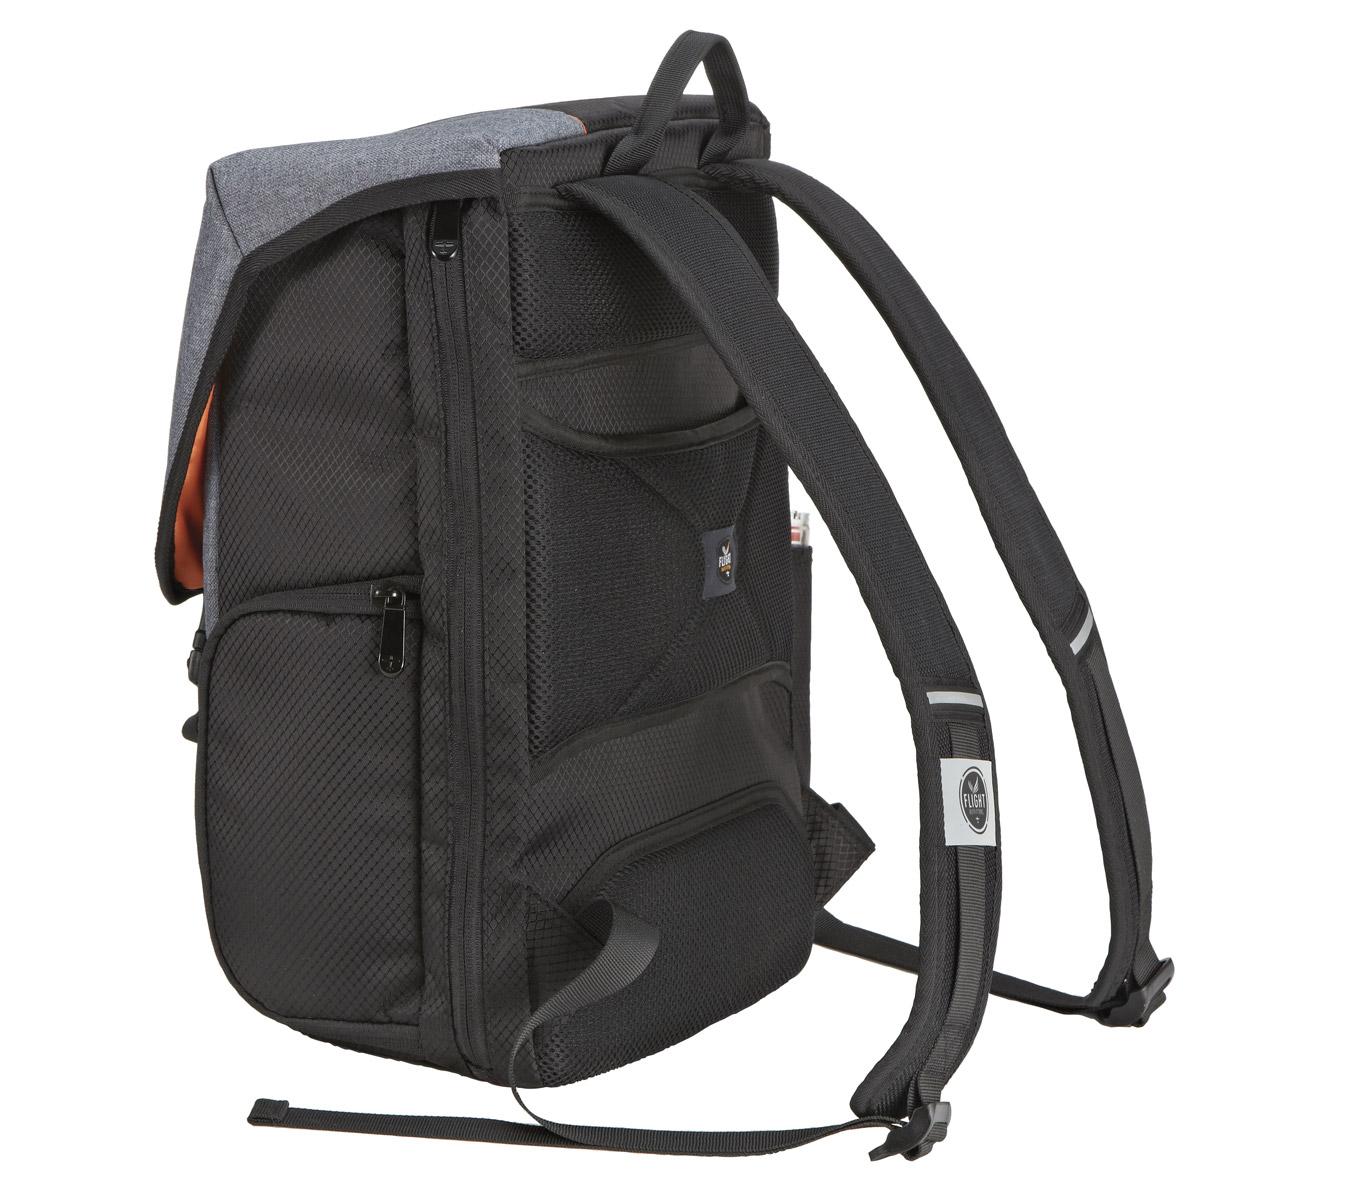 1dfaf4f393 Flight Outfitters Centerline Backpack - MyPilotStore.com